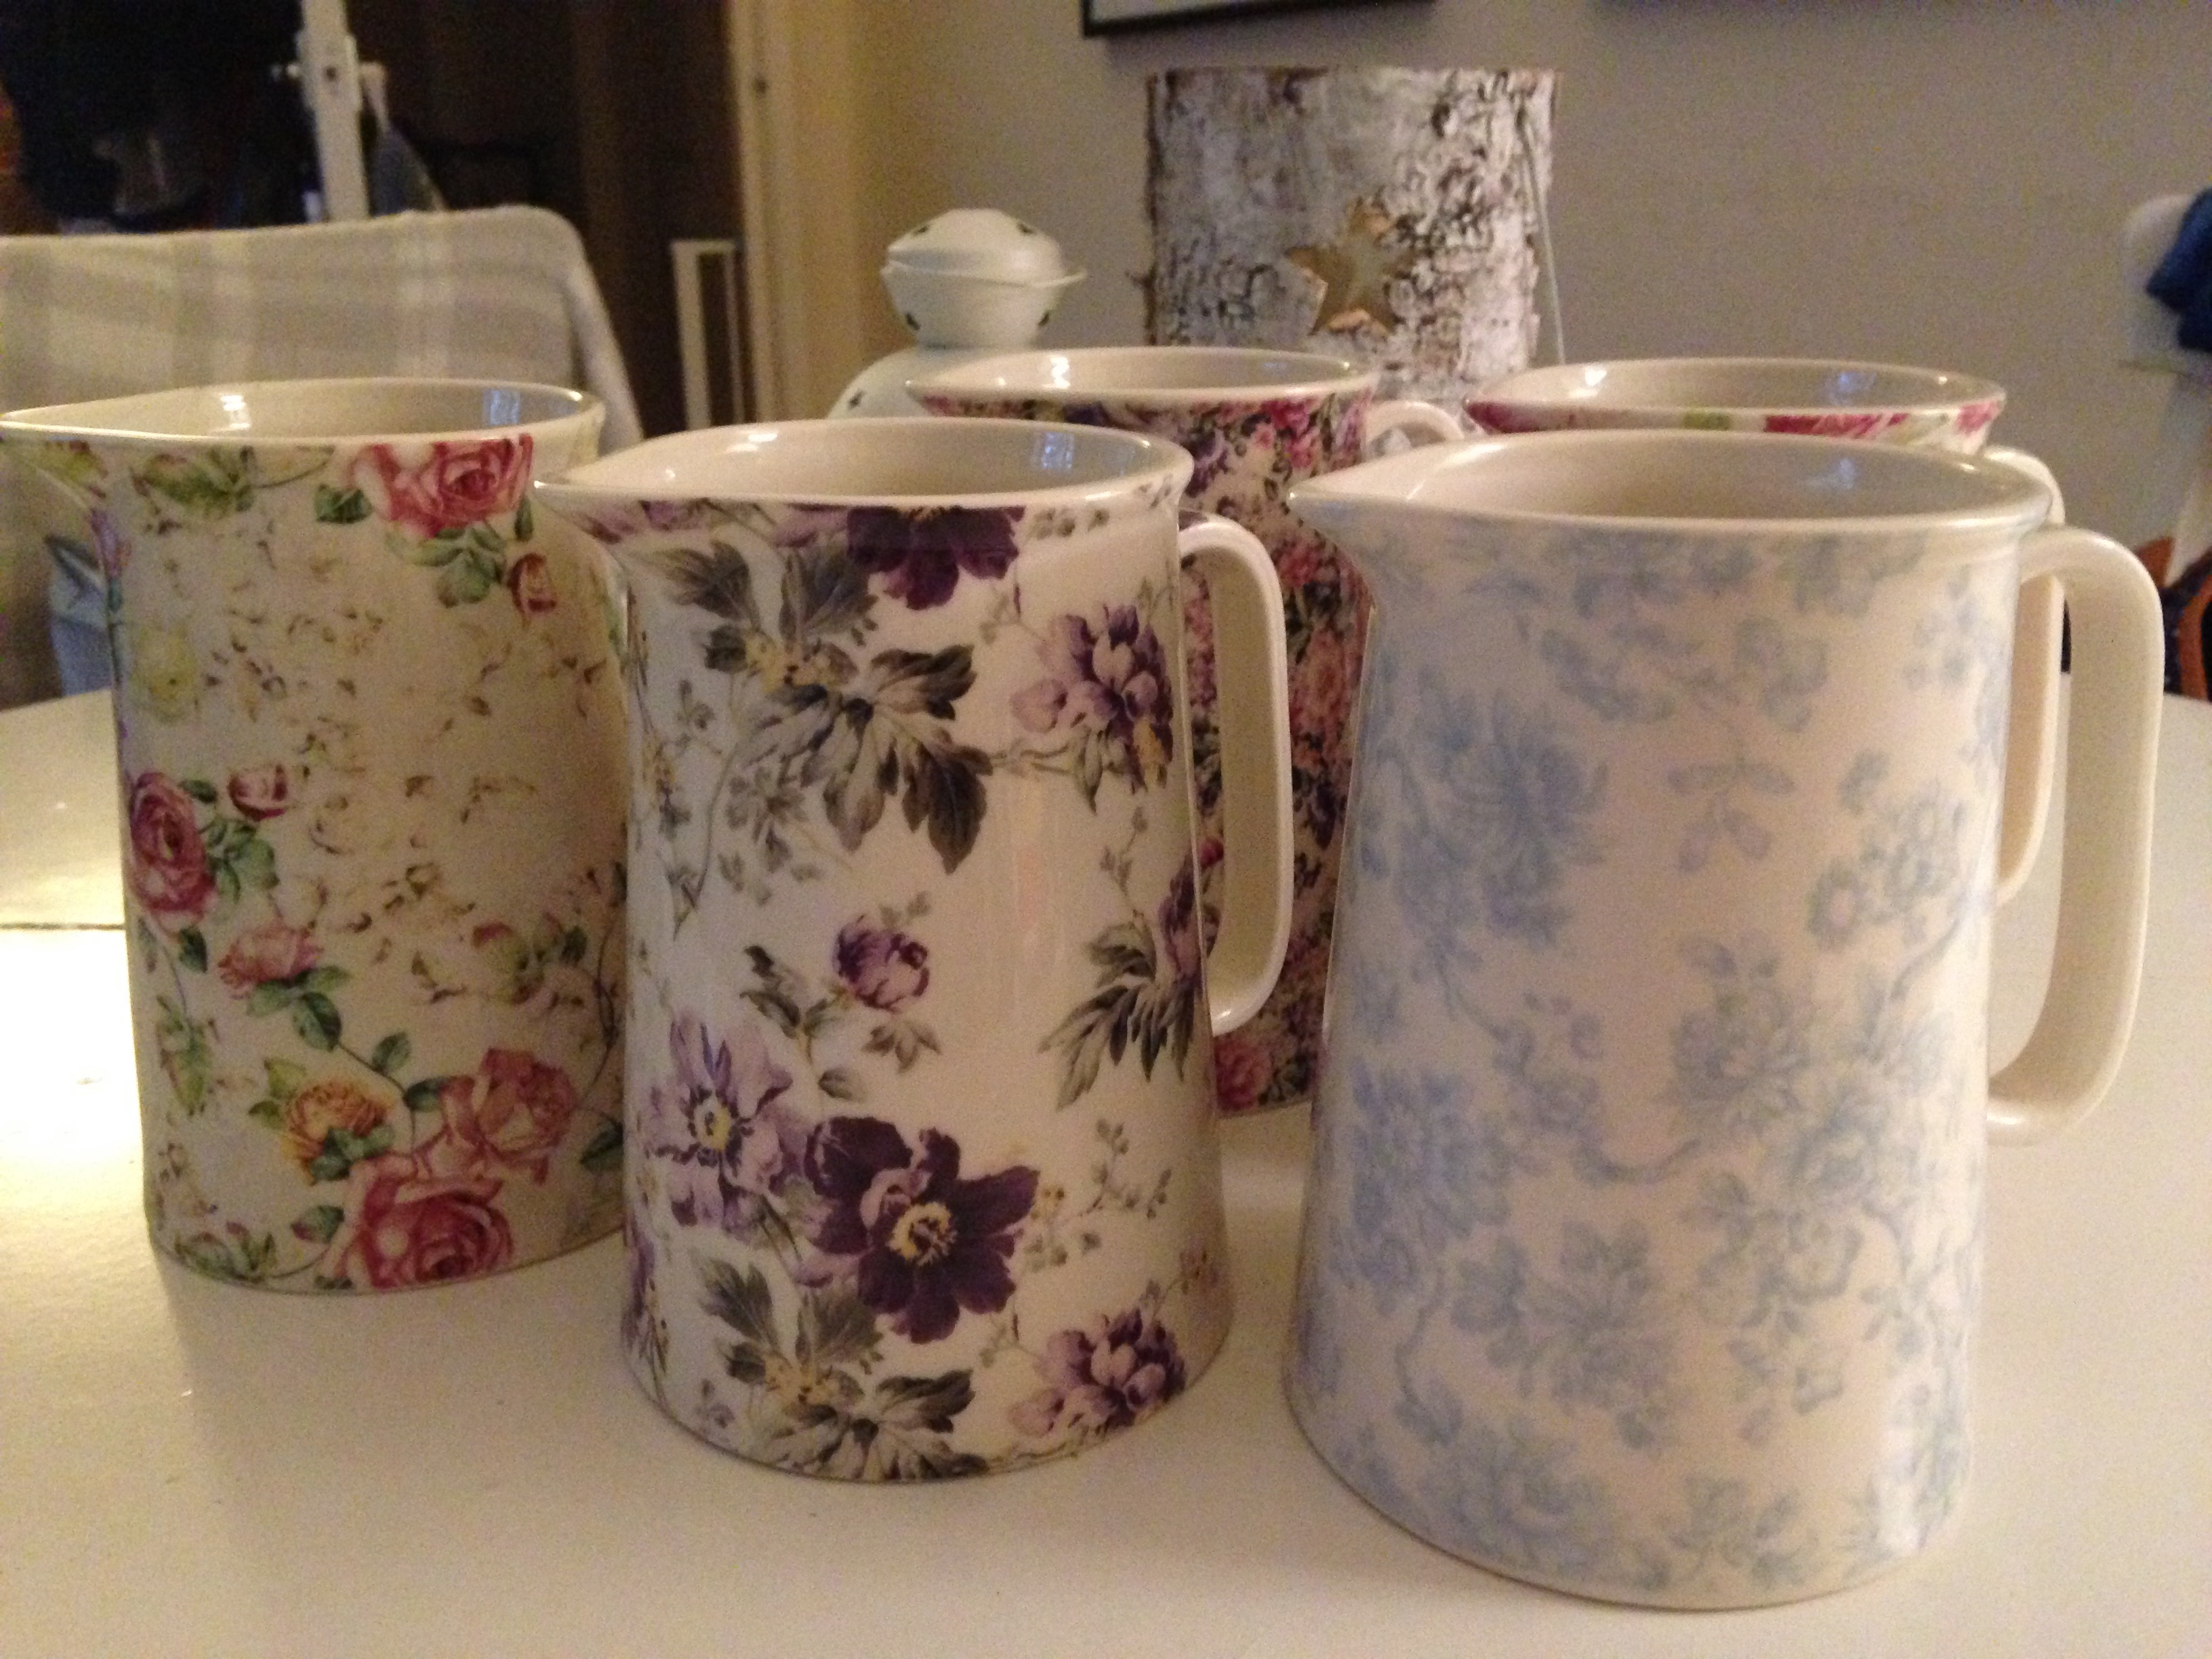 Floral Ceramic Milk Jugs